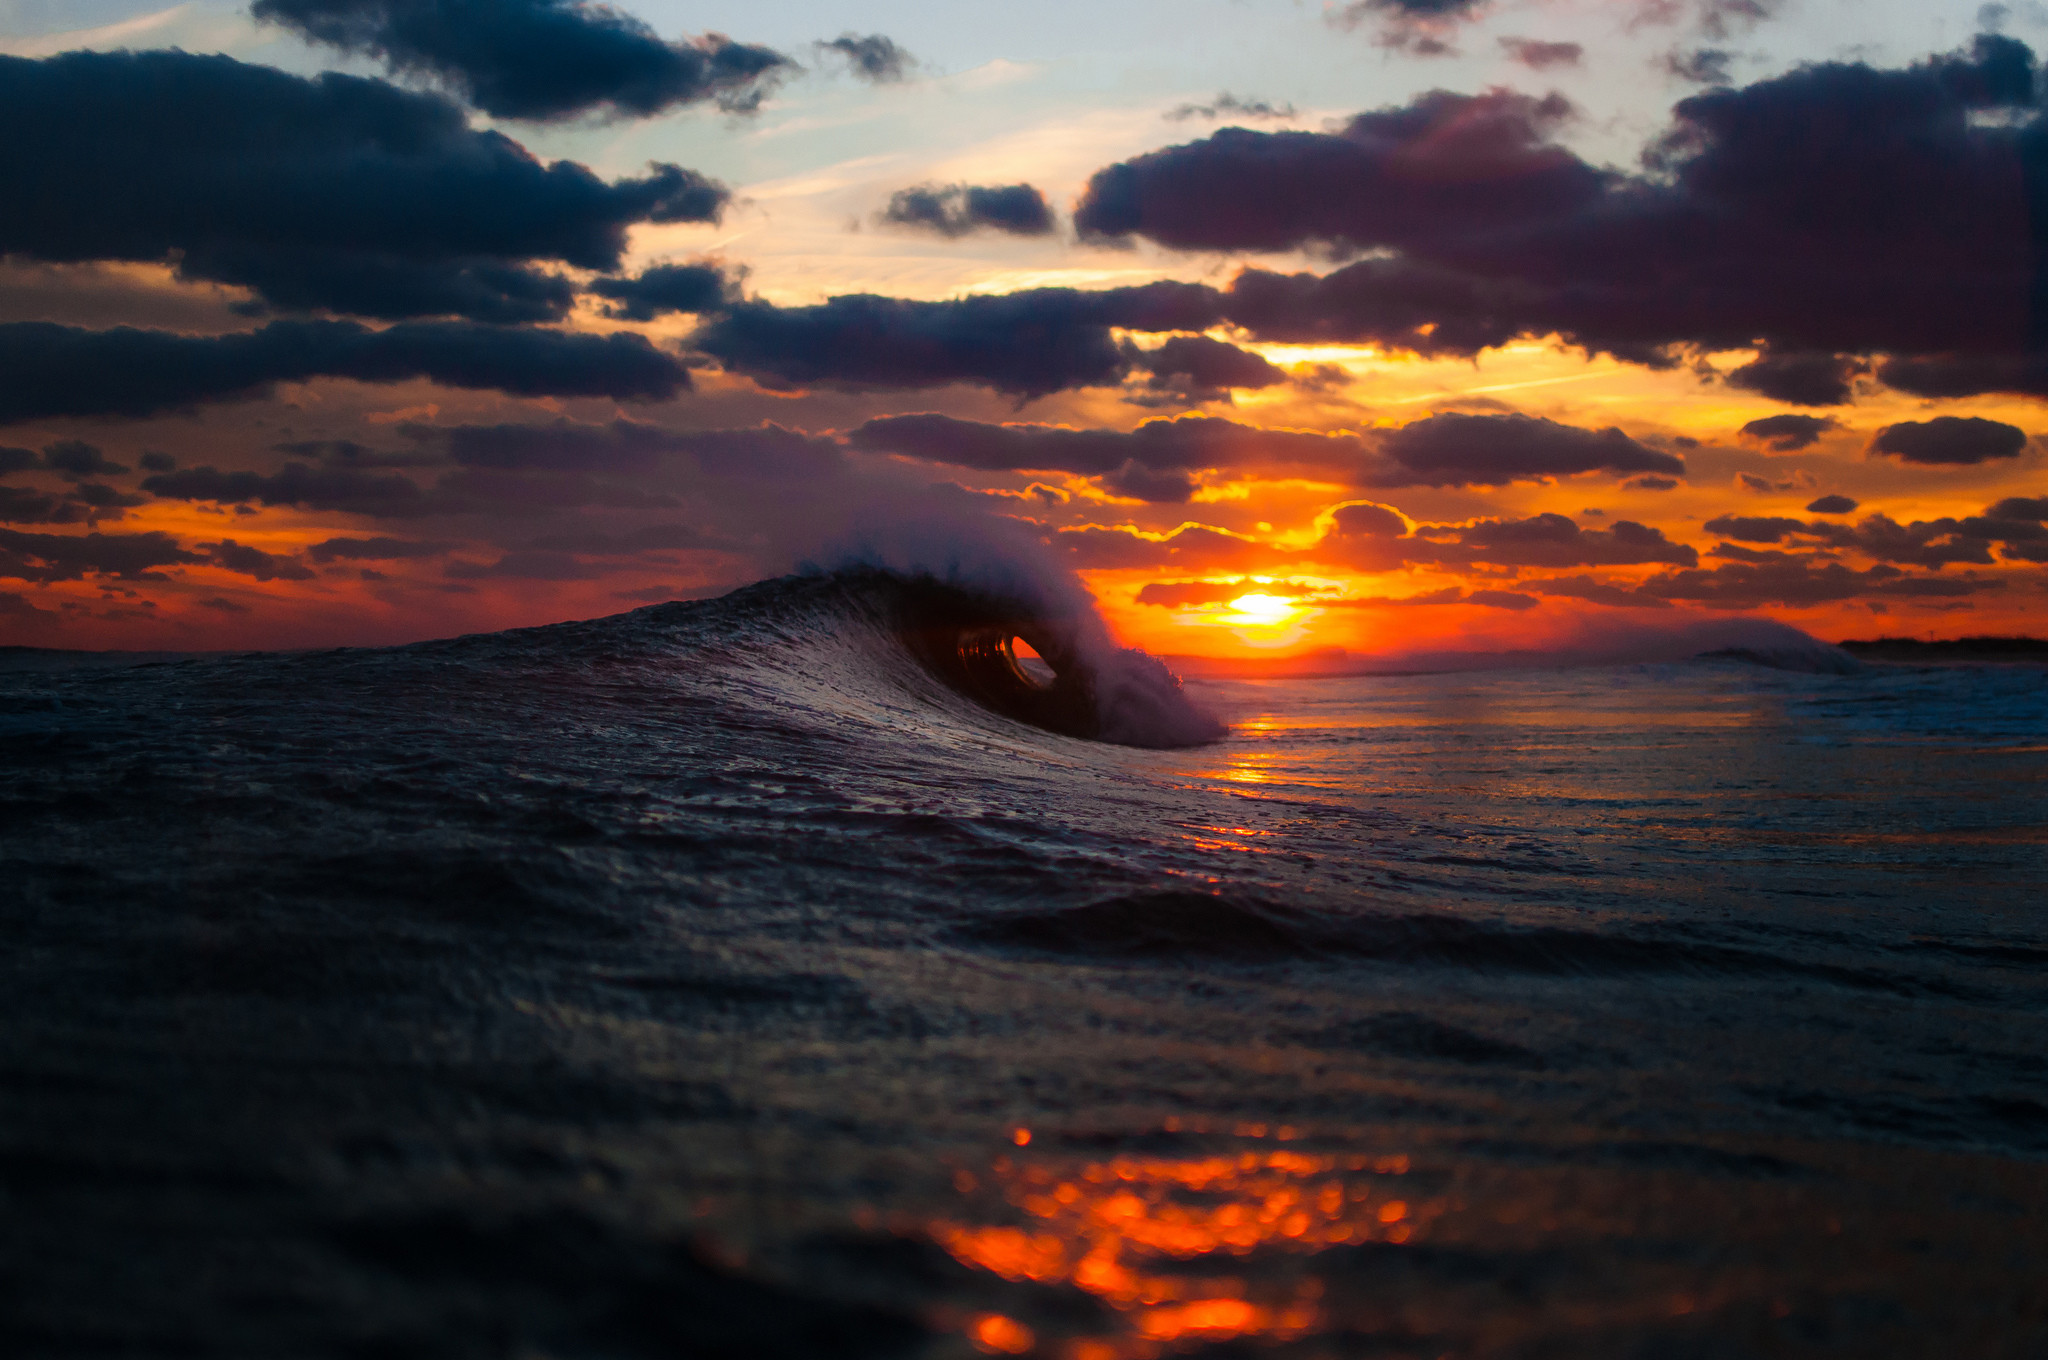 Ocean Waves Sunset Photos